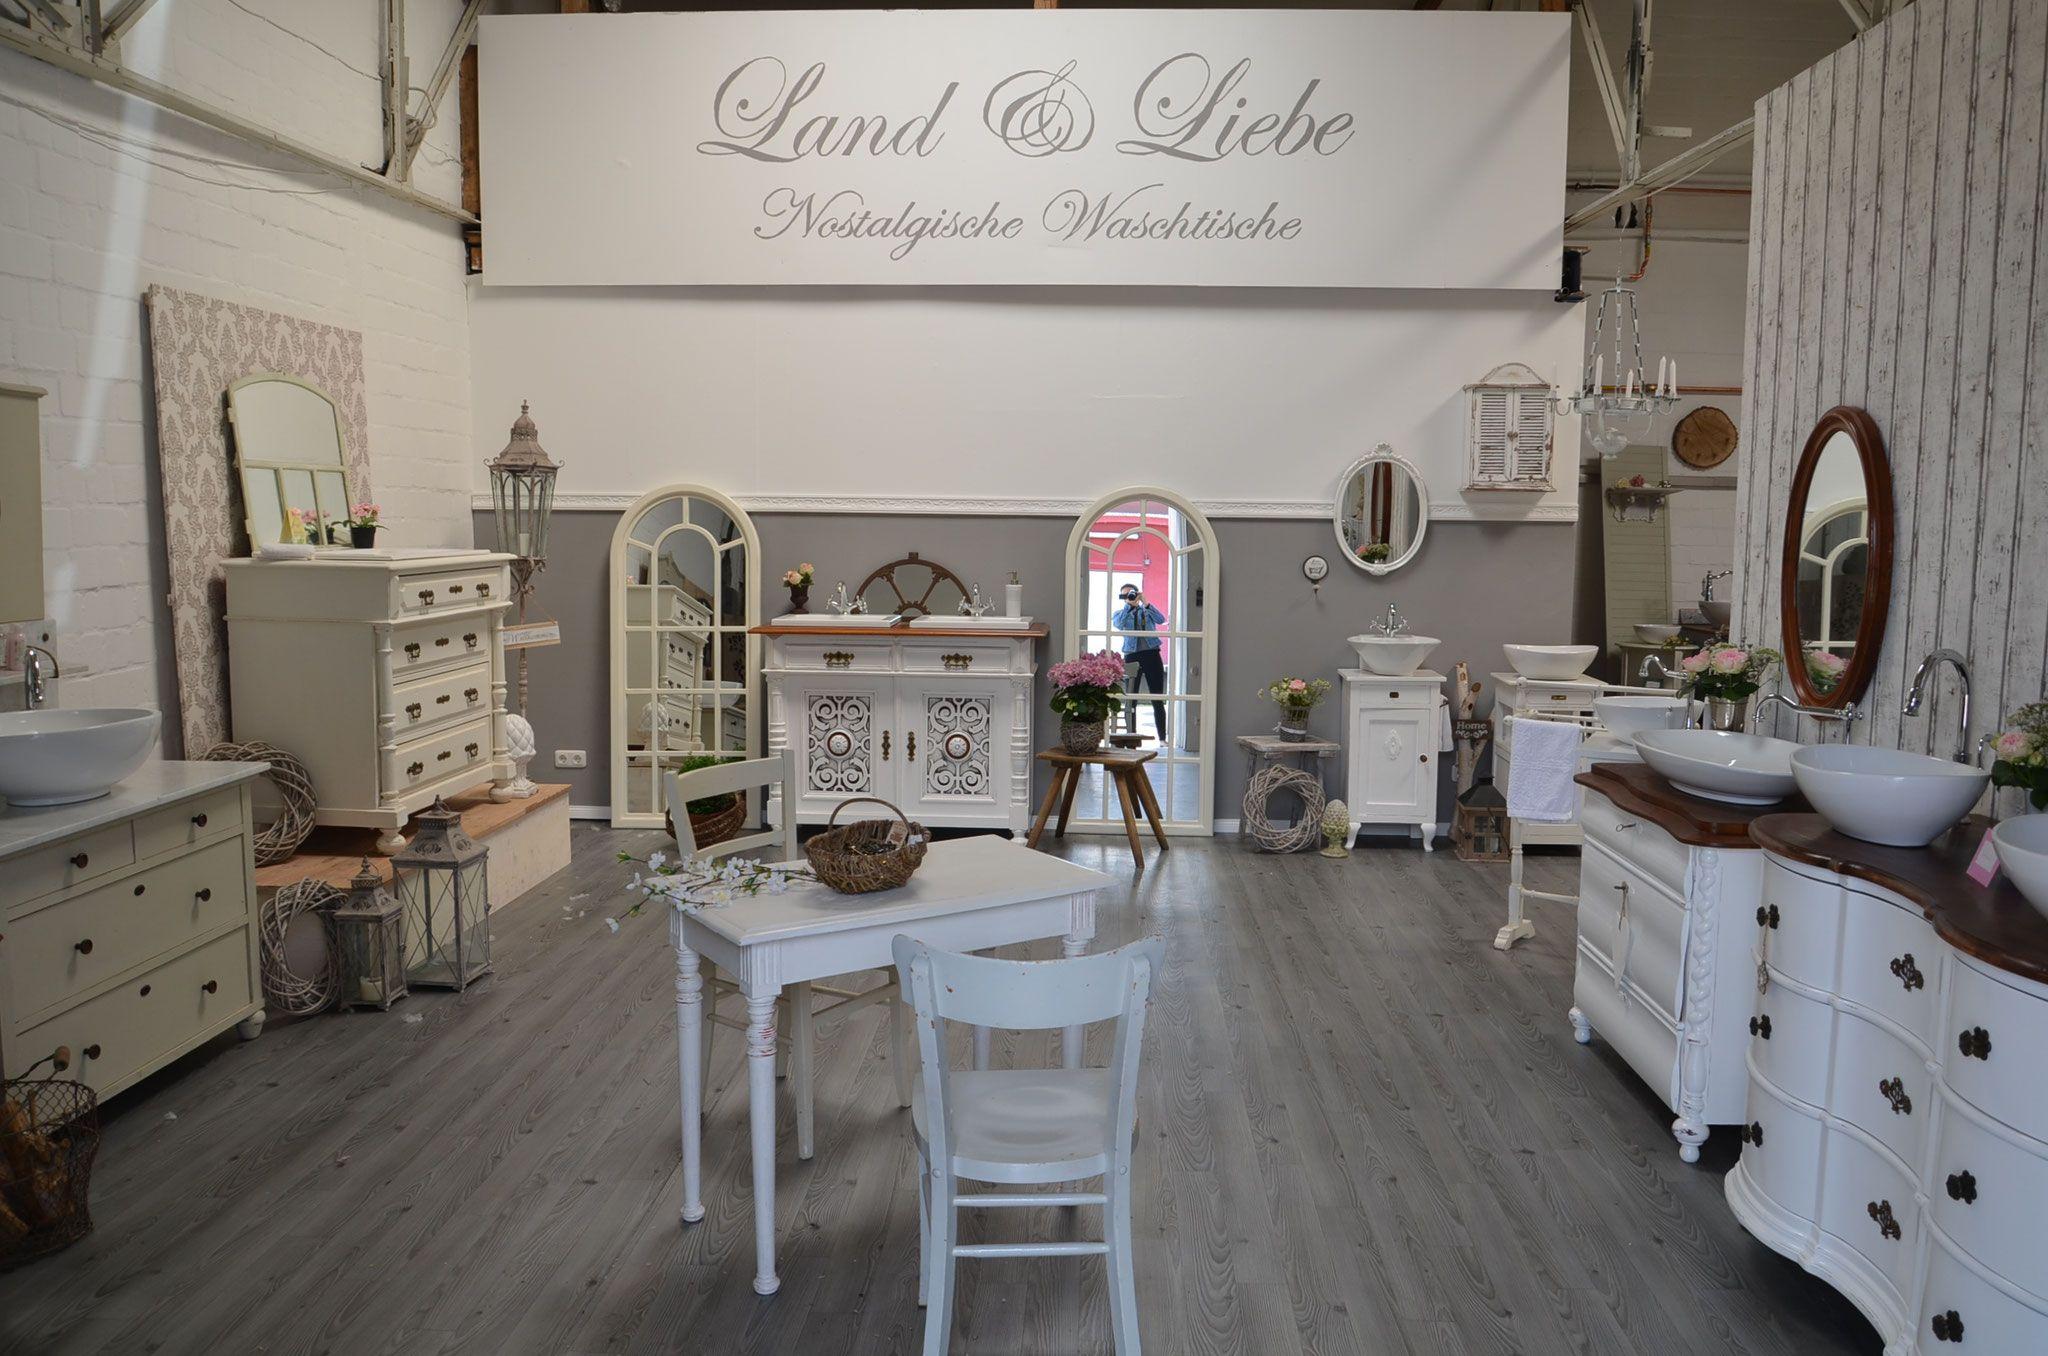 Badezimmermöbel vintage ~ Badmöbel landhaus vintage möbel in hamburg bad